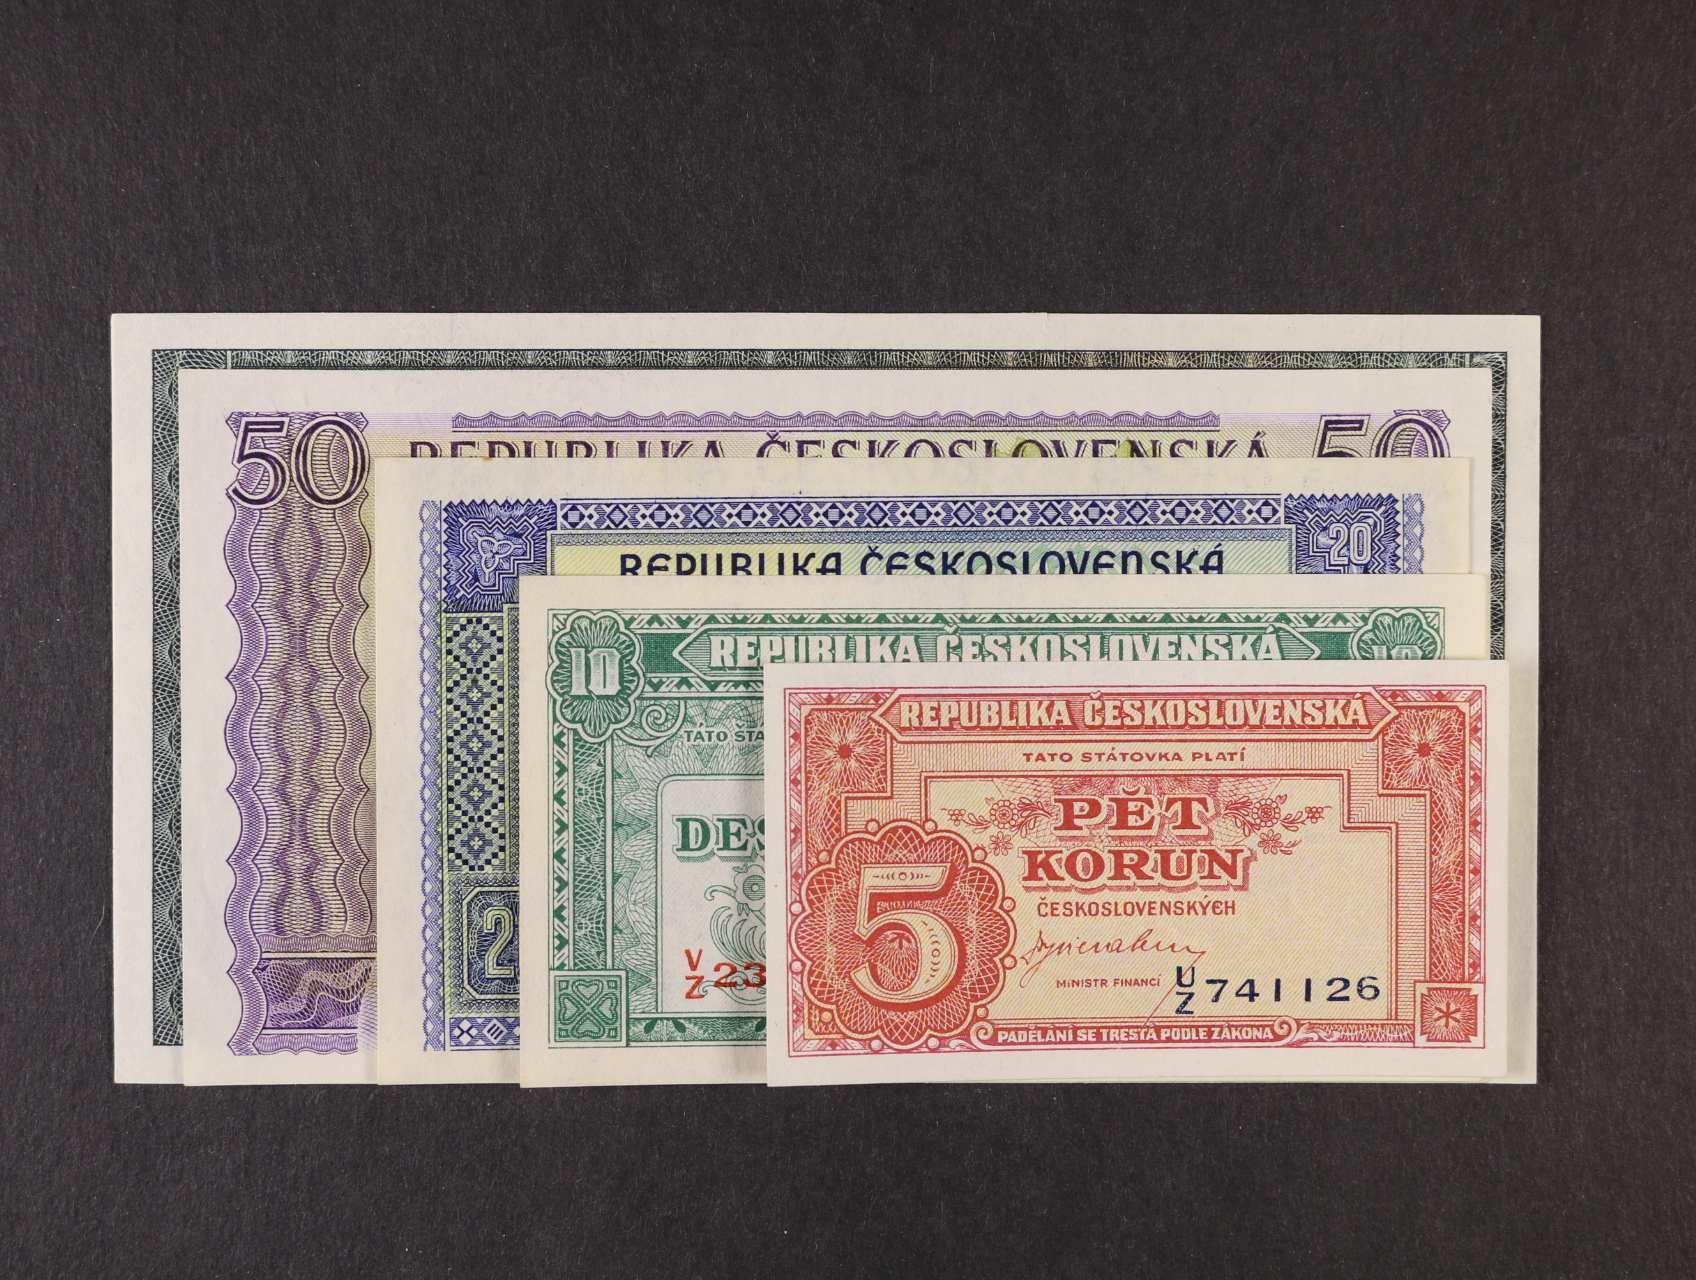 5, 10, 20, 50, 100 Kčs 1945, Ba. 70 - 74, Pi. 59a - 63a